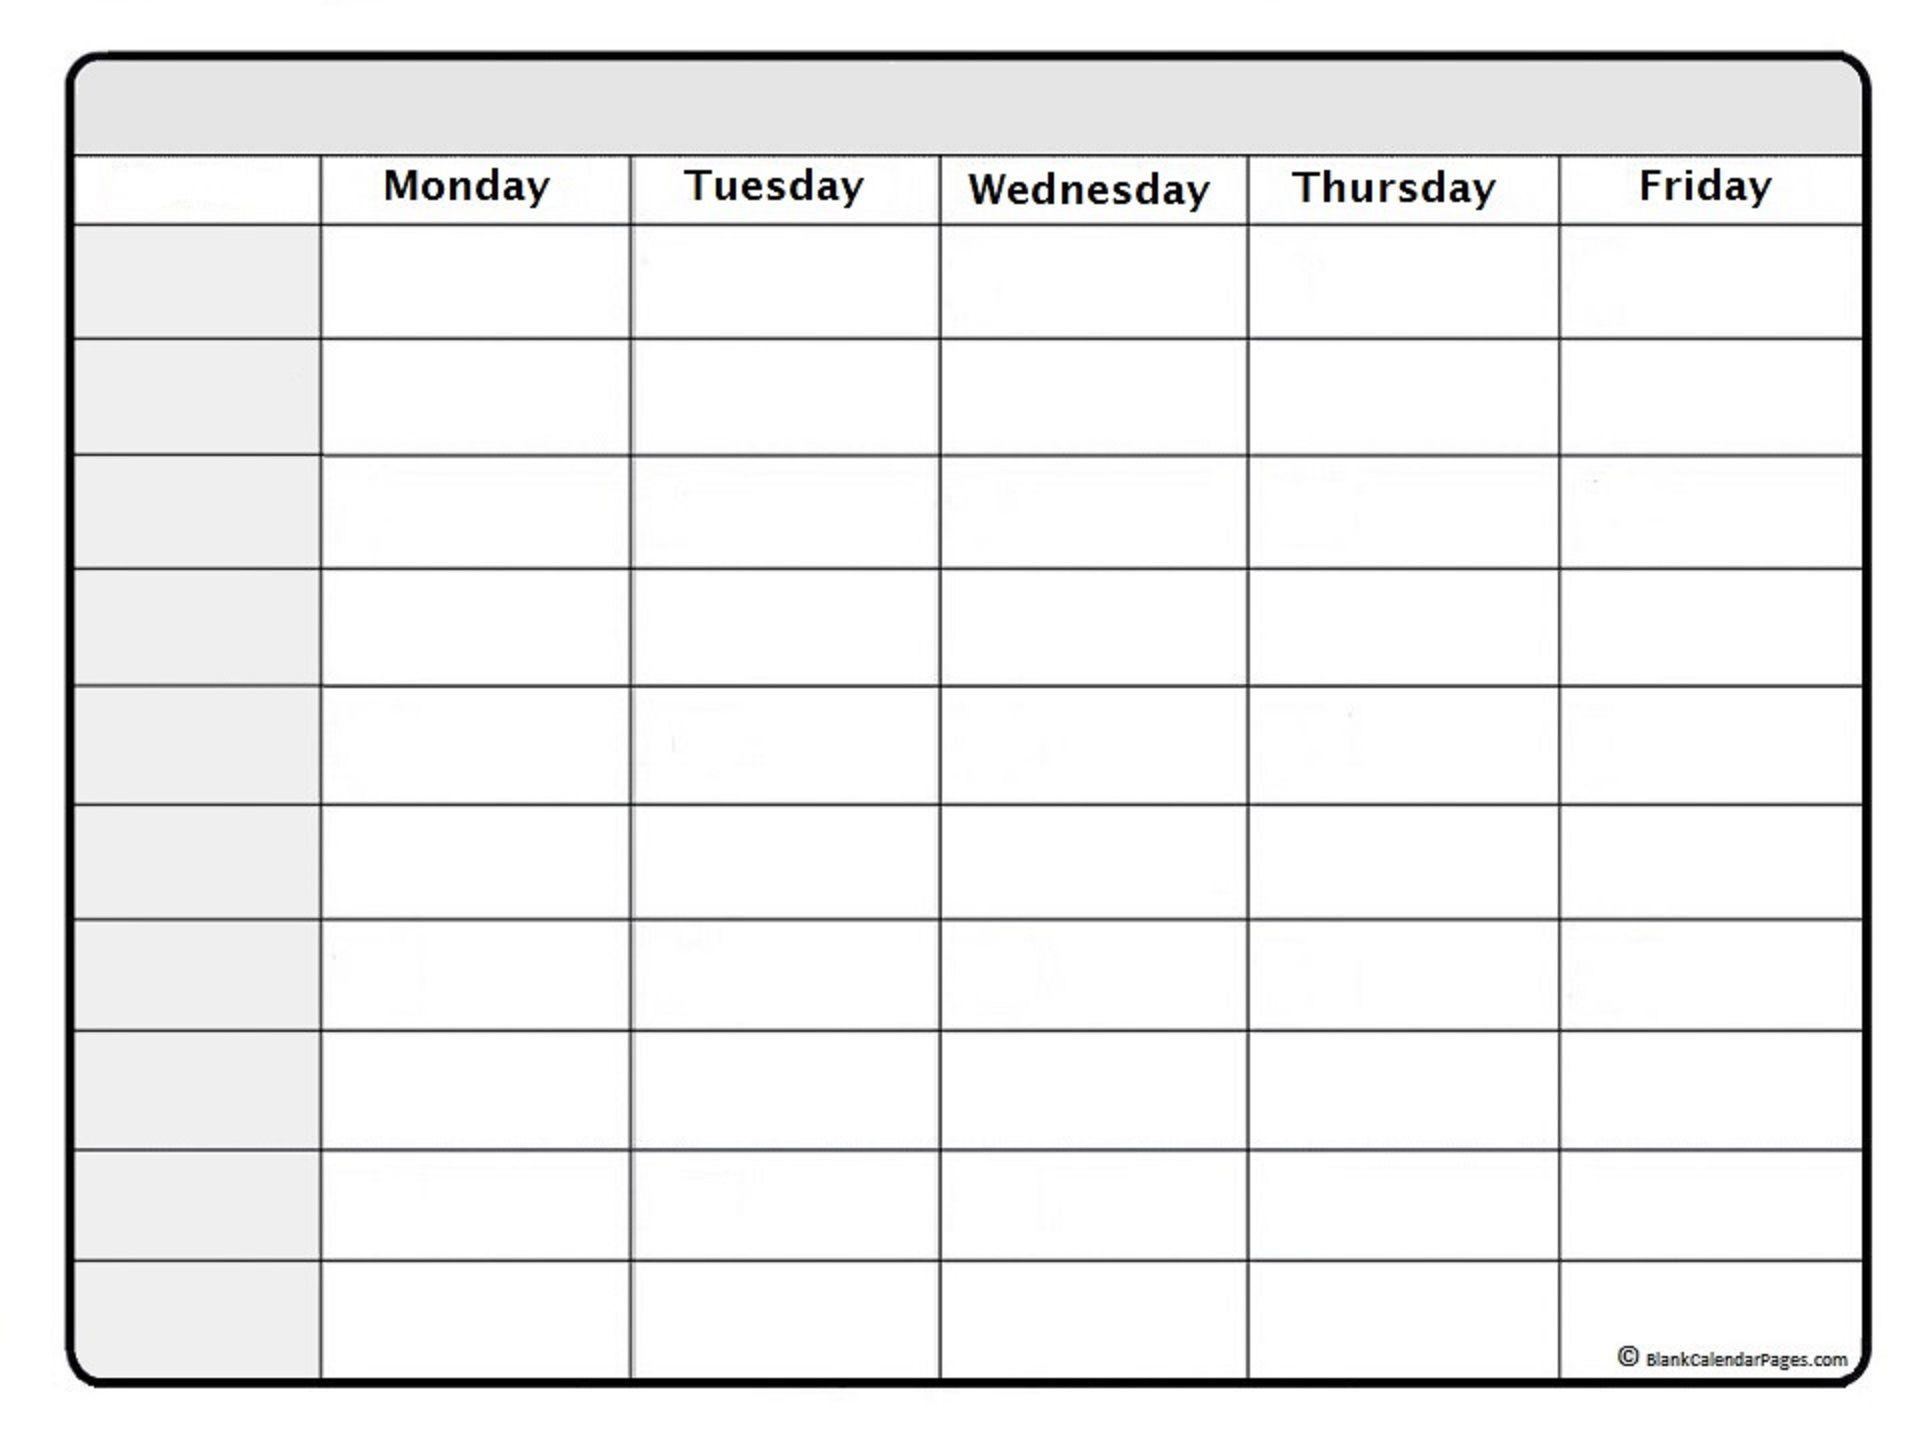 001 Breathtaking Weekly Calendar Template 2020 Highest Clarity  Printable Blank FreeFull